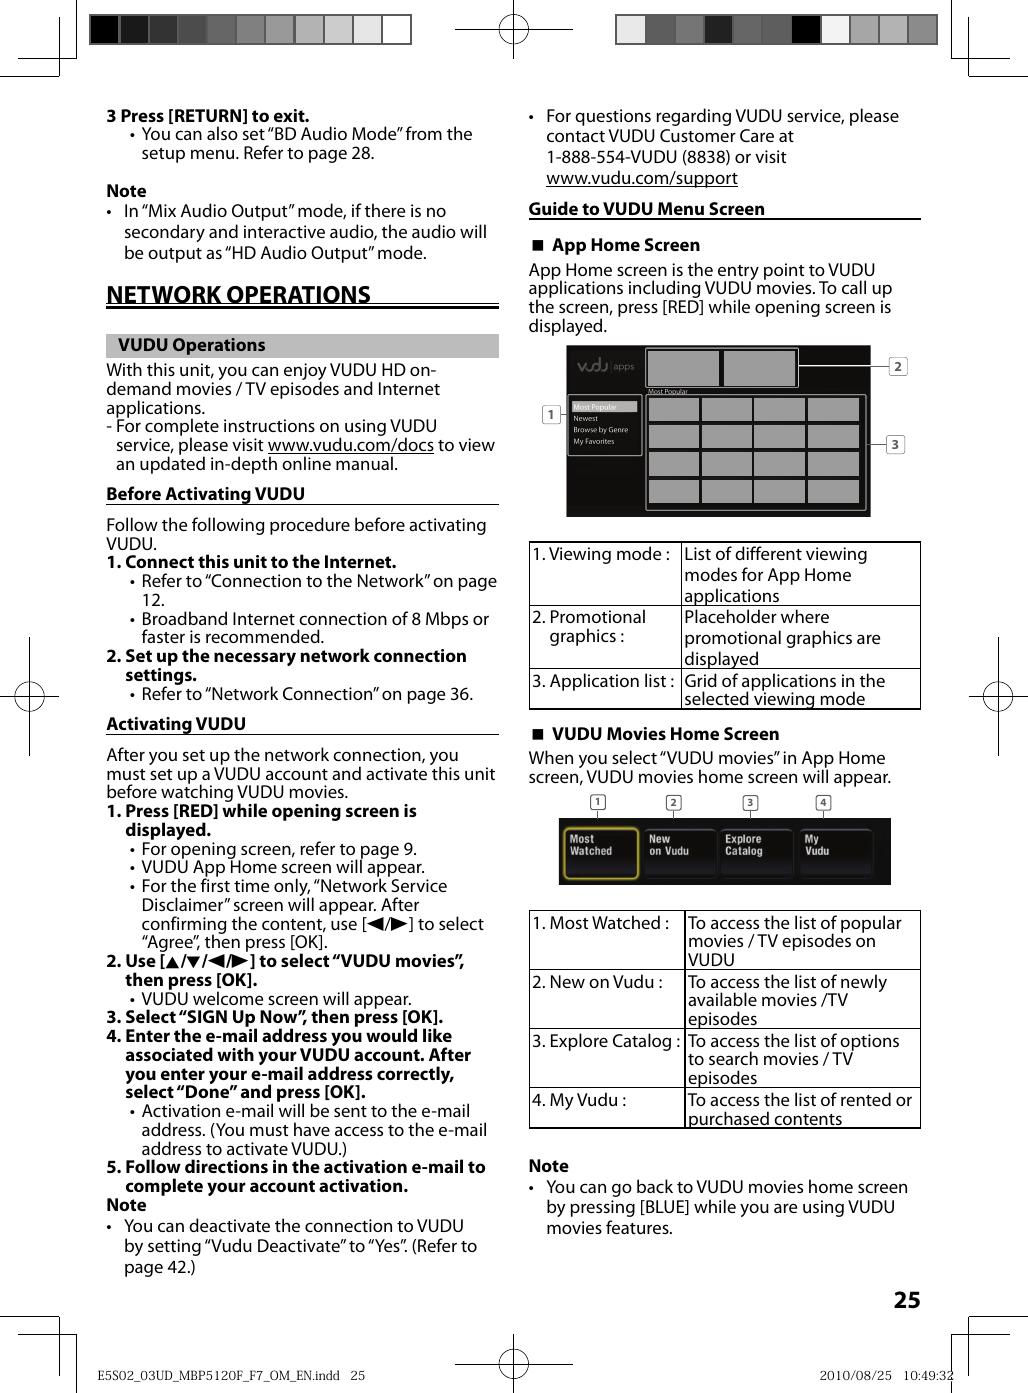 Funai Mbp5120F F7 Users Manual E5S02_03UD_MBP5120F_F7_OM_EN